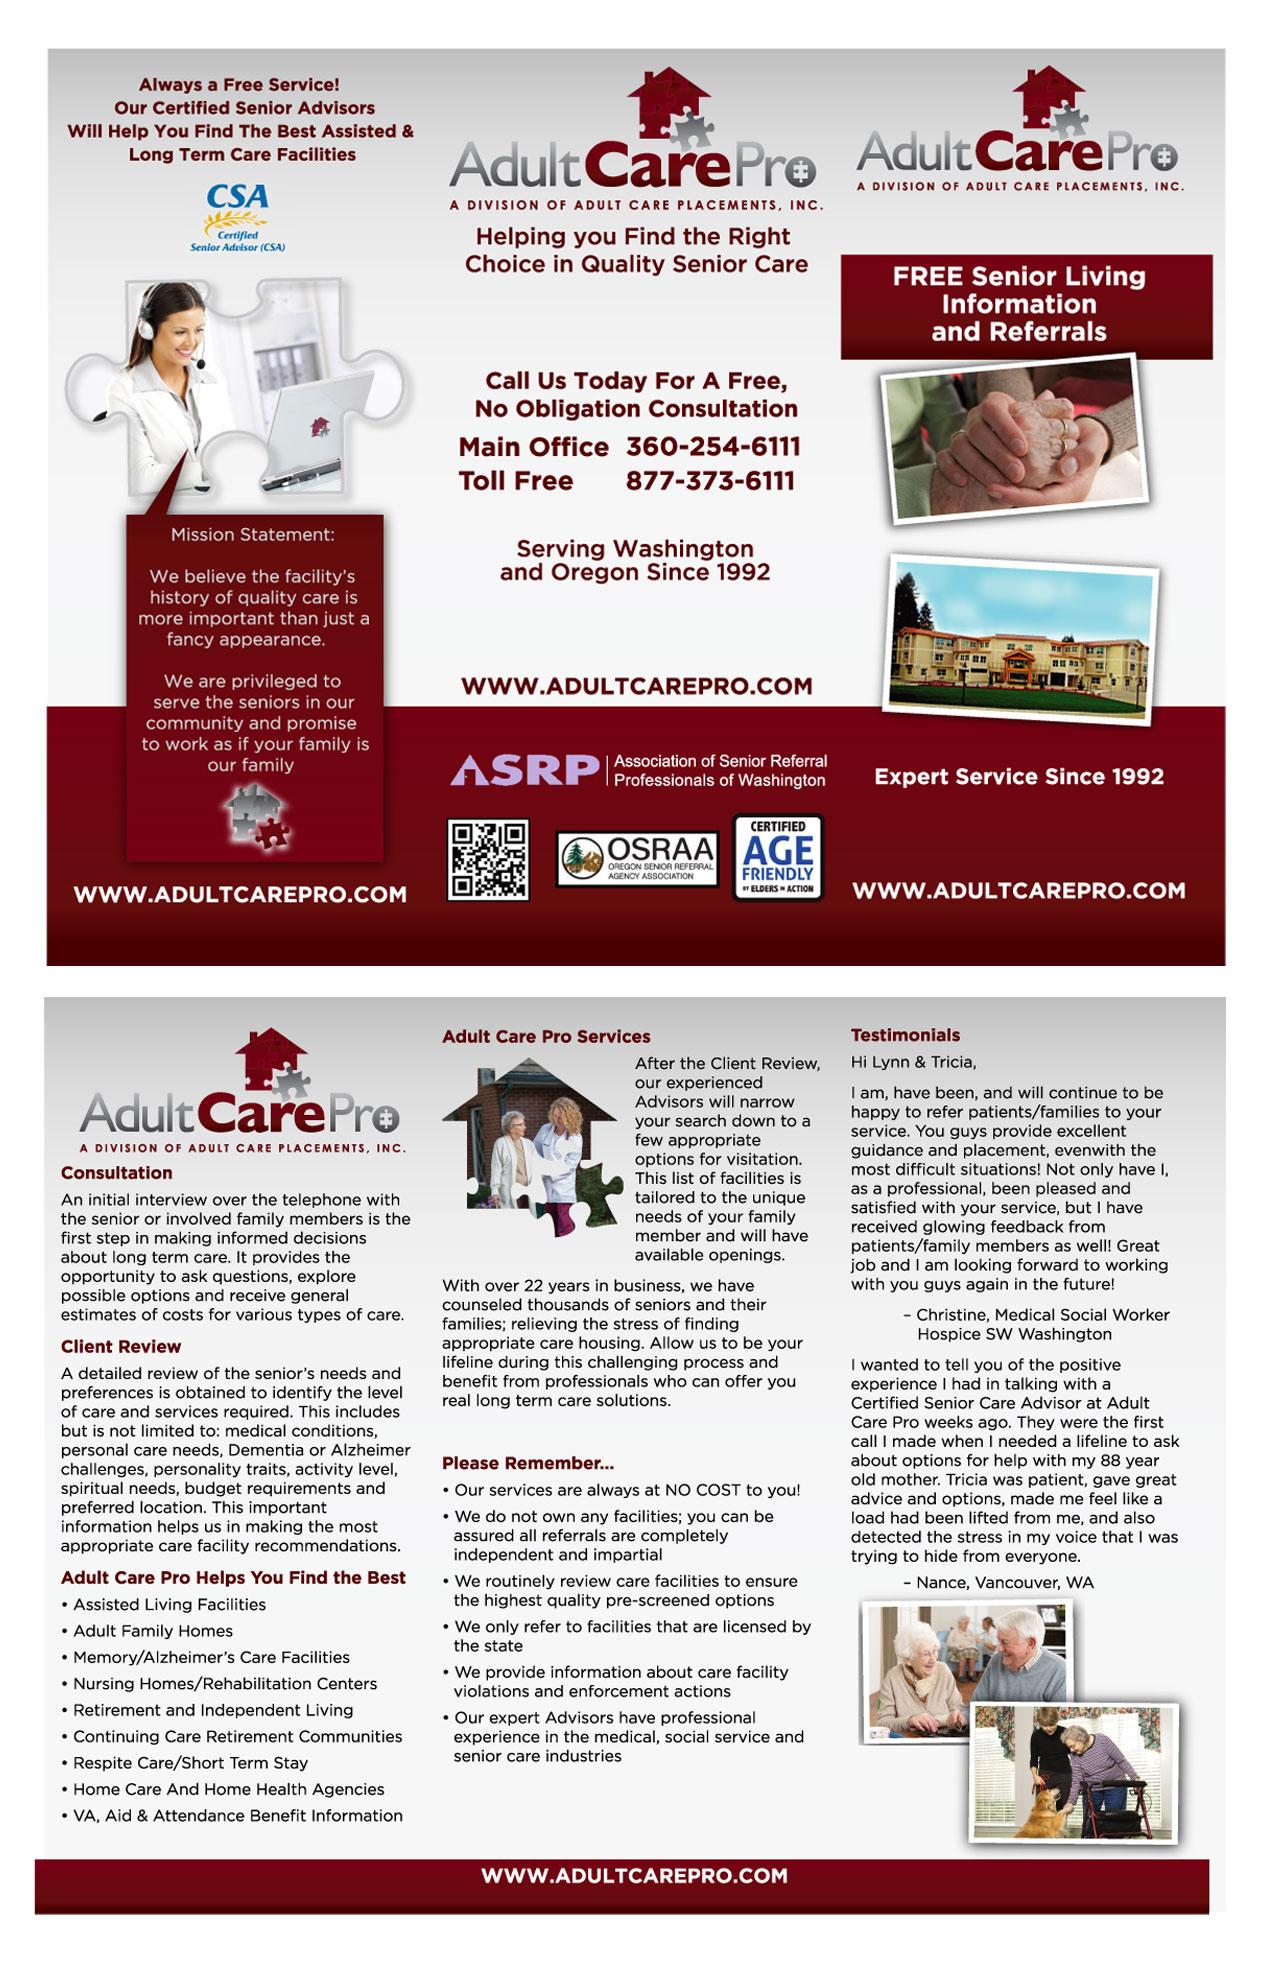 ACP_Brochure